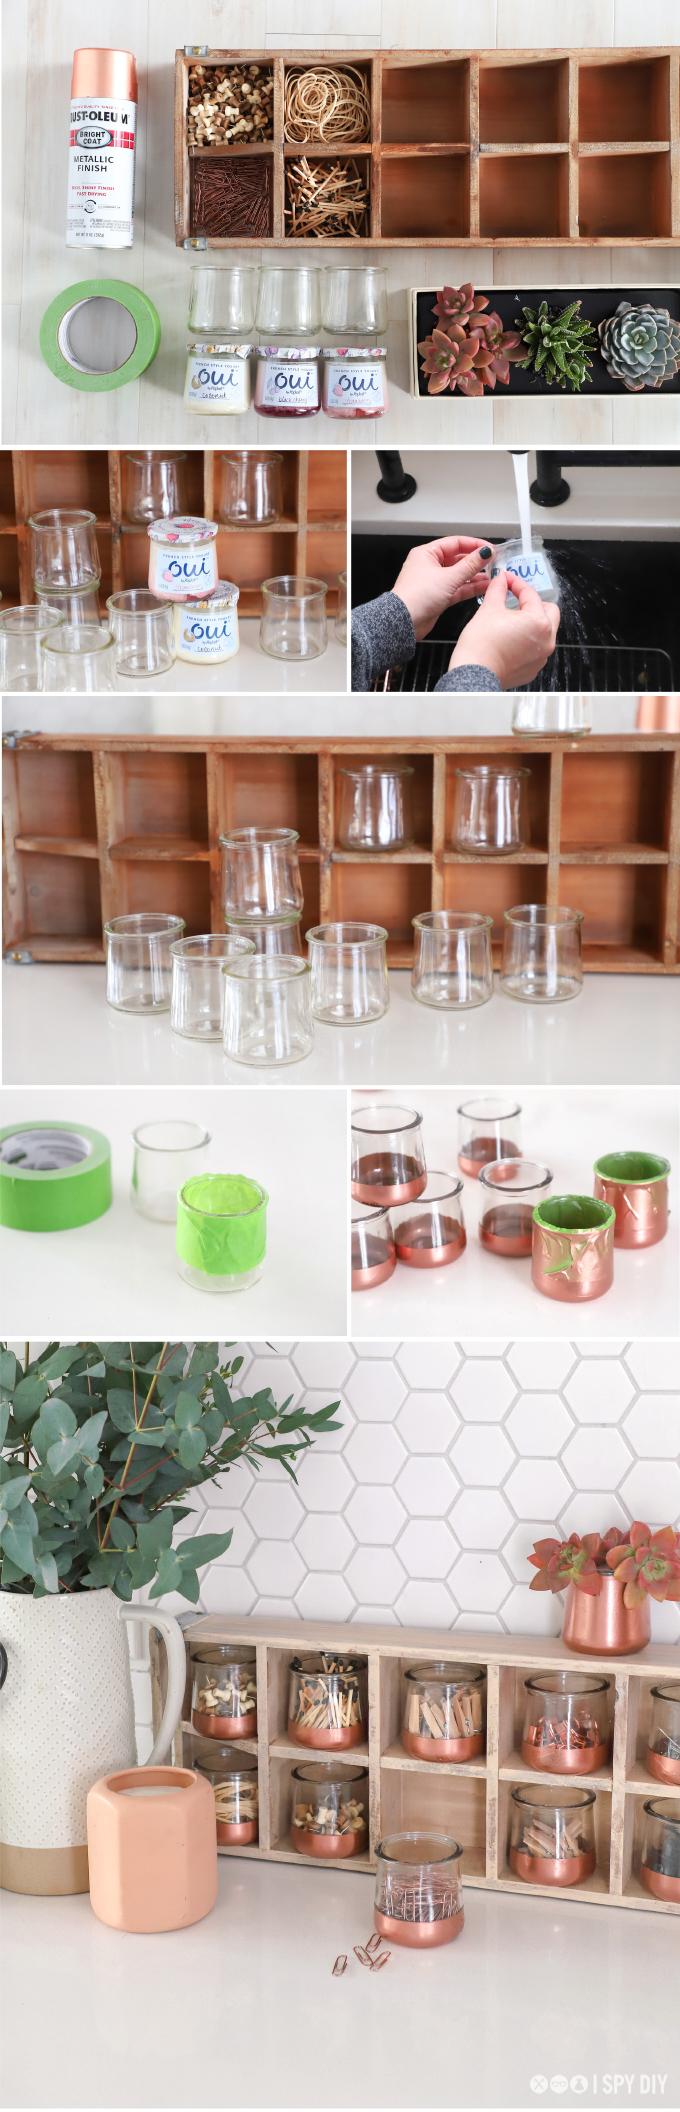 Diy Organization Glass Pot Catch All I Spy Diy